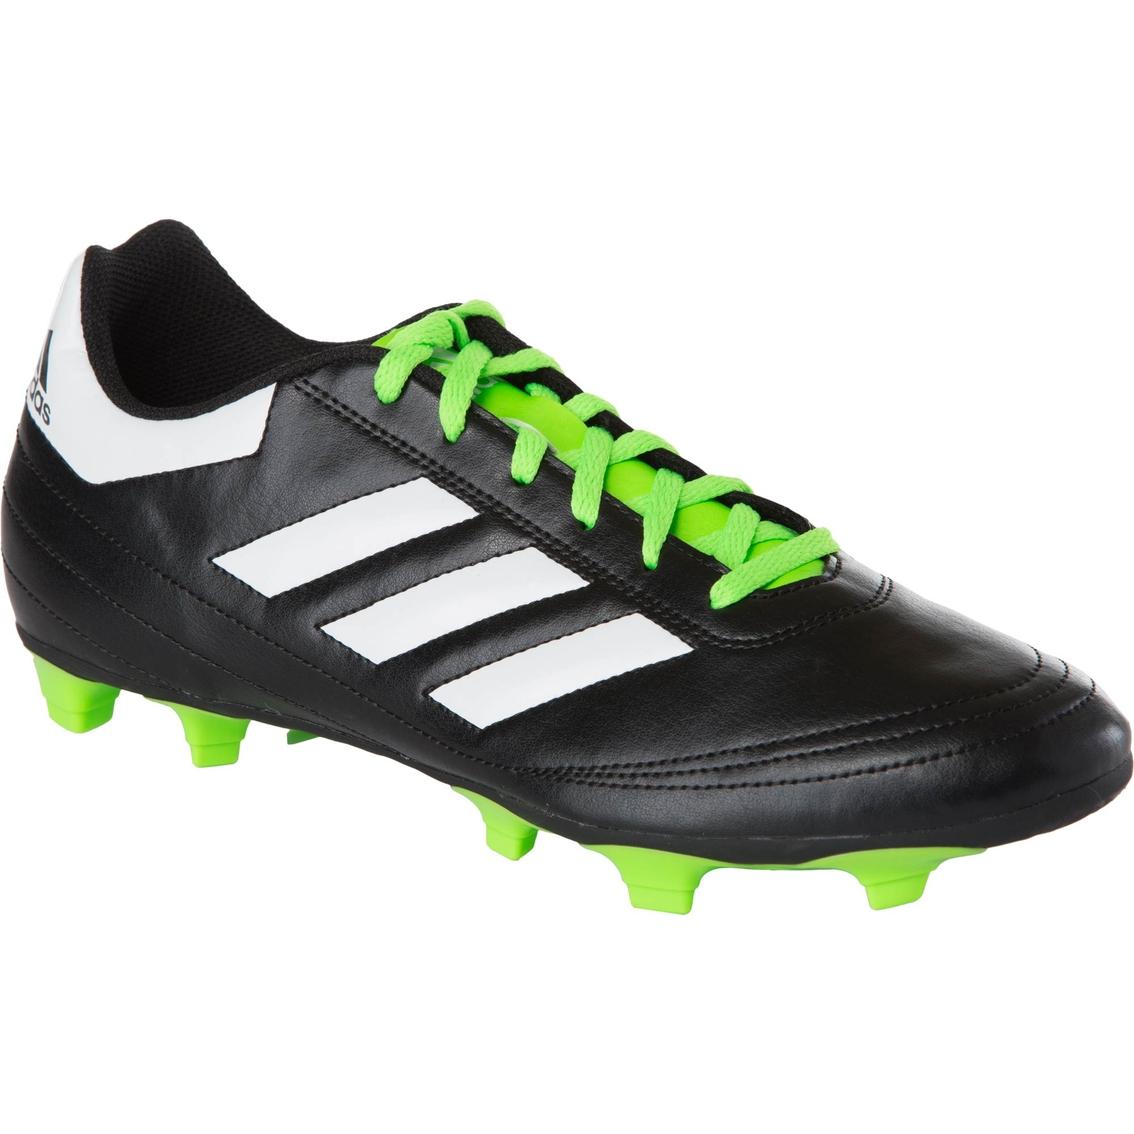 ed9c85dcaed Adidas Men s Goletto Vi Fg Soccer Cleats